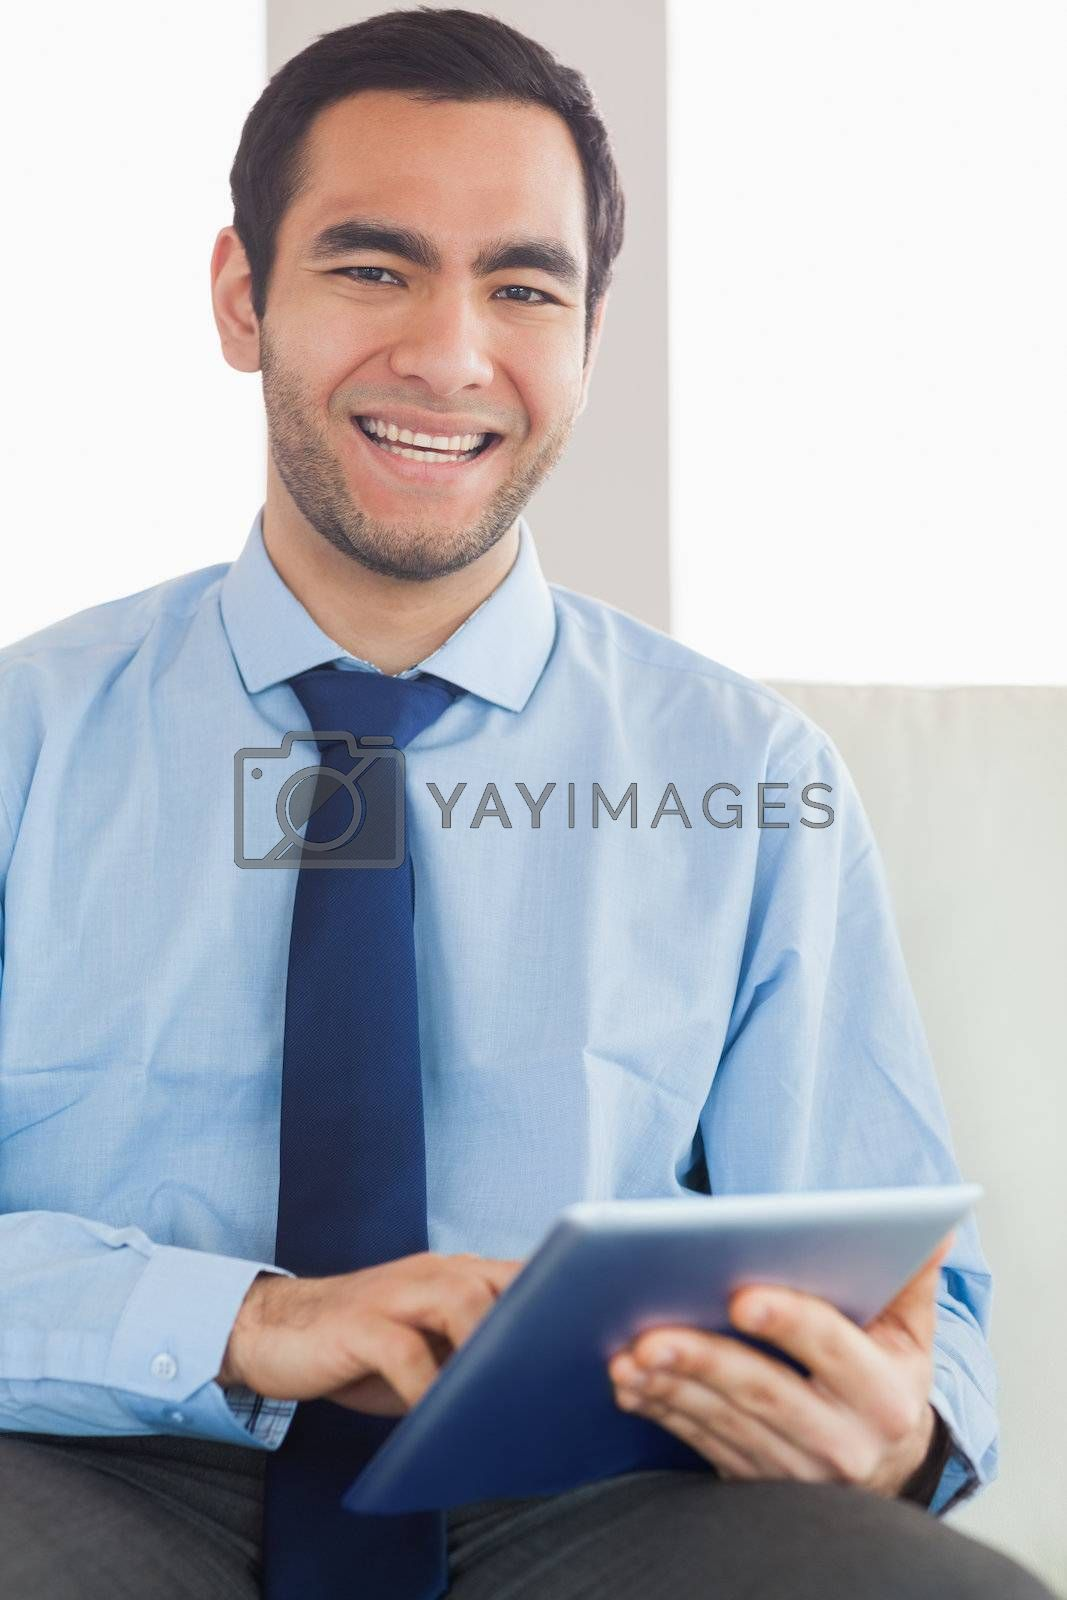 Smiling classy businessman using tablet pc by Wavebreakmedia